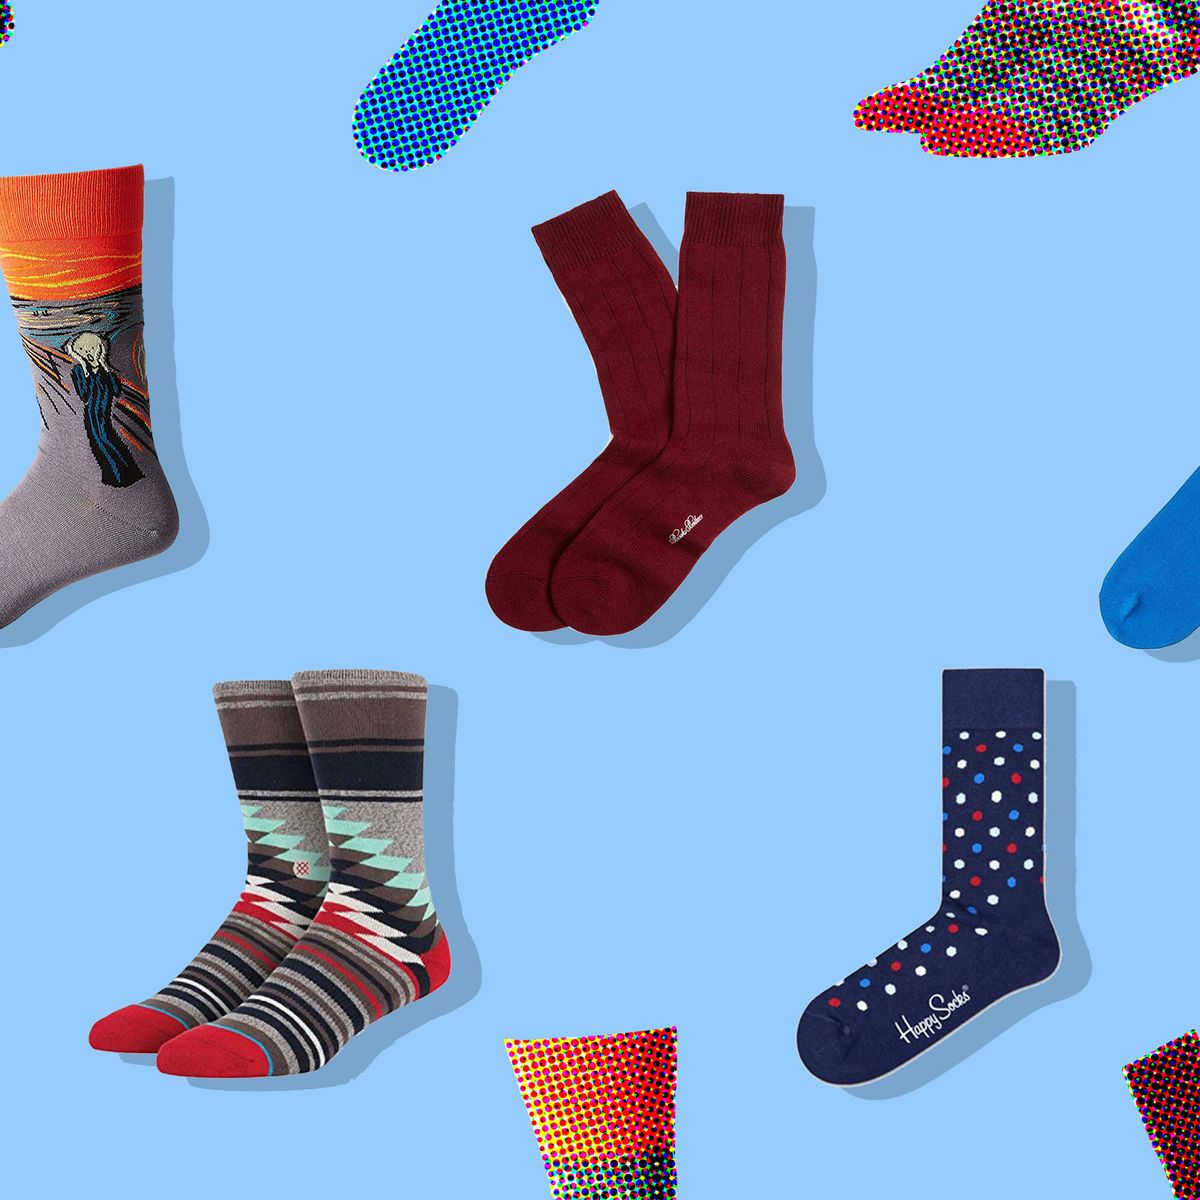 cd5ea8aaf8c50 The Best Men's Socks Reviews 2018